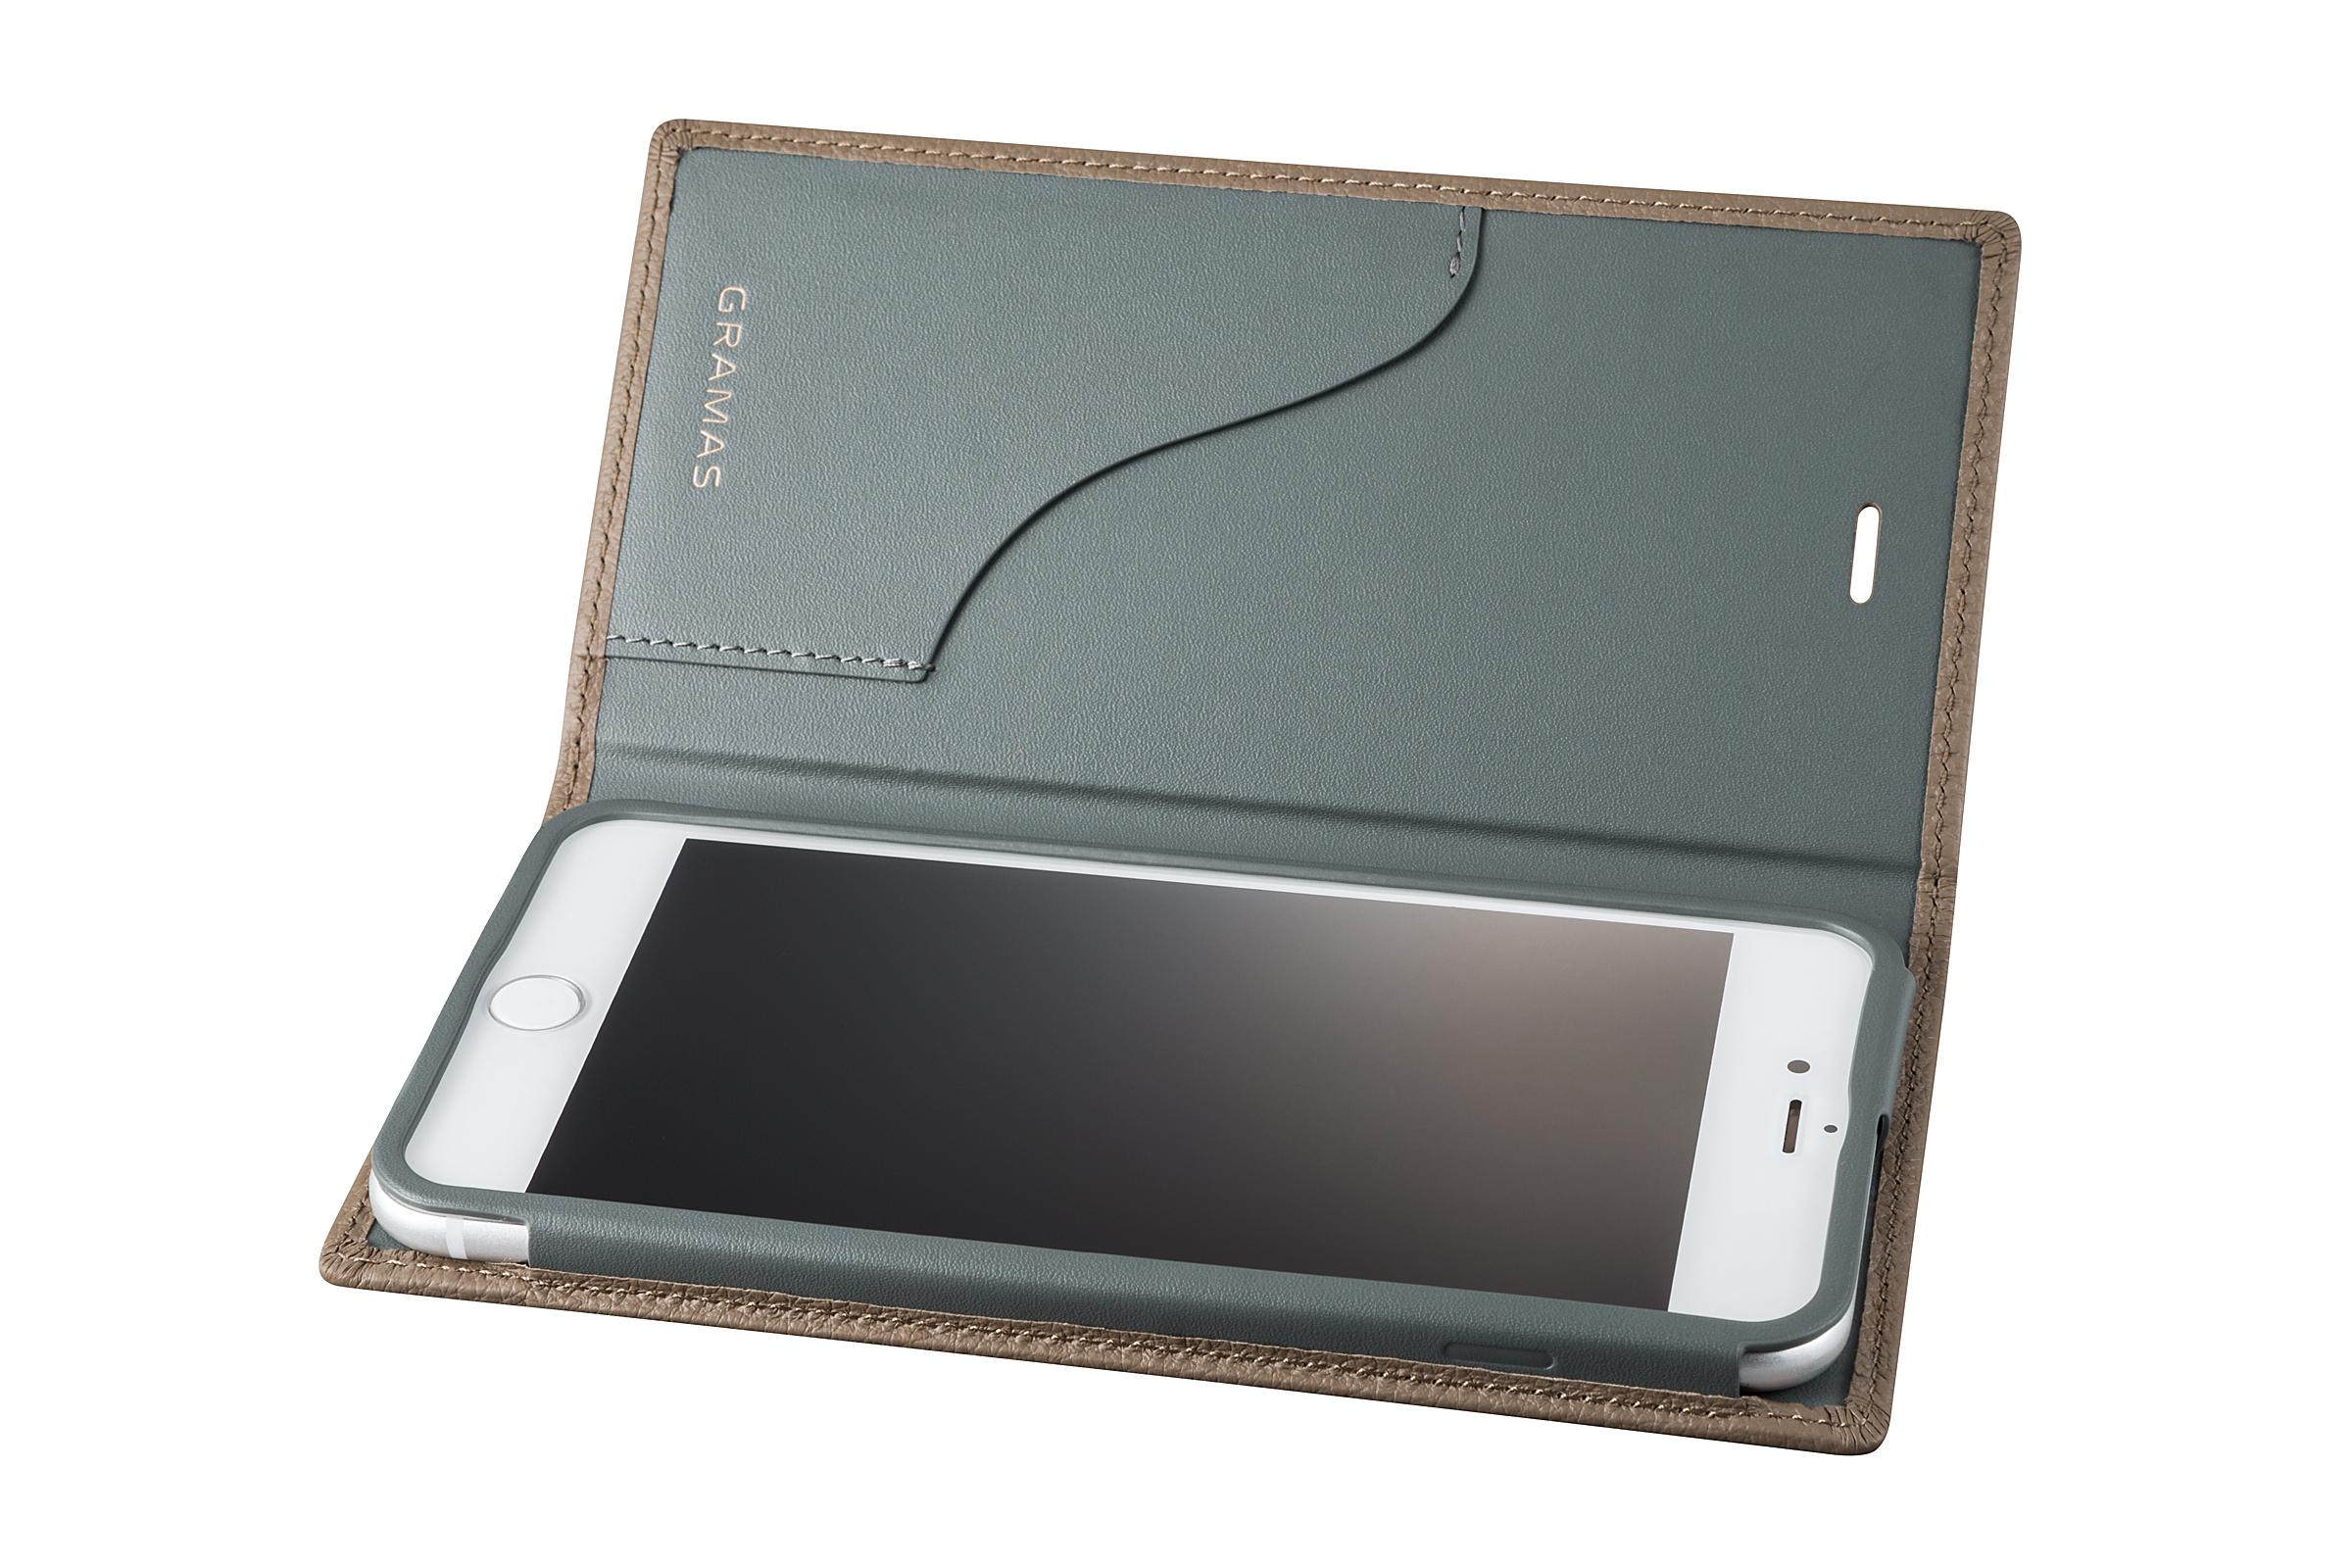 GRAMAS Shrunken-calf Full Leather Case for iPhone 7 Plus(Taupe(トープ)) シュランケンカーフ 手帳型フルレザーケース - 画像3